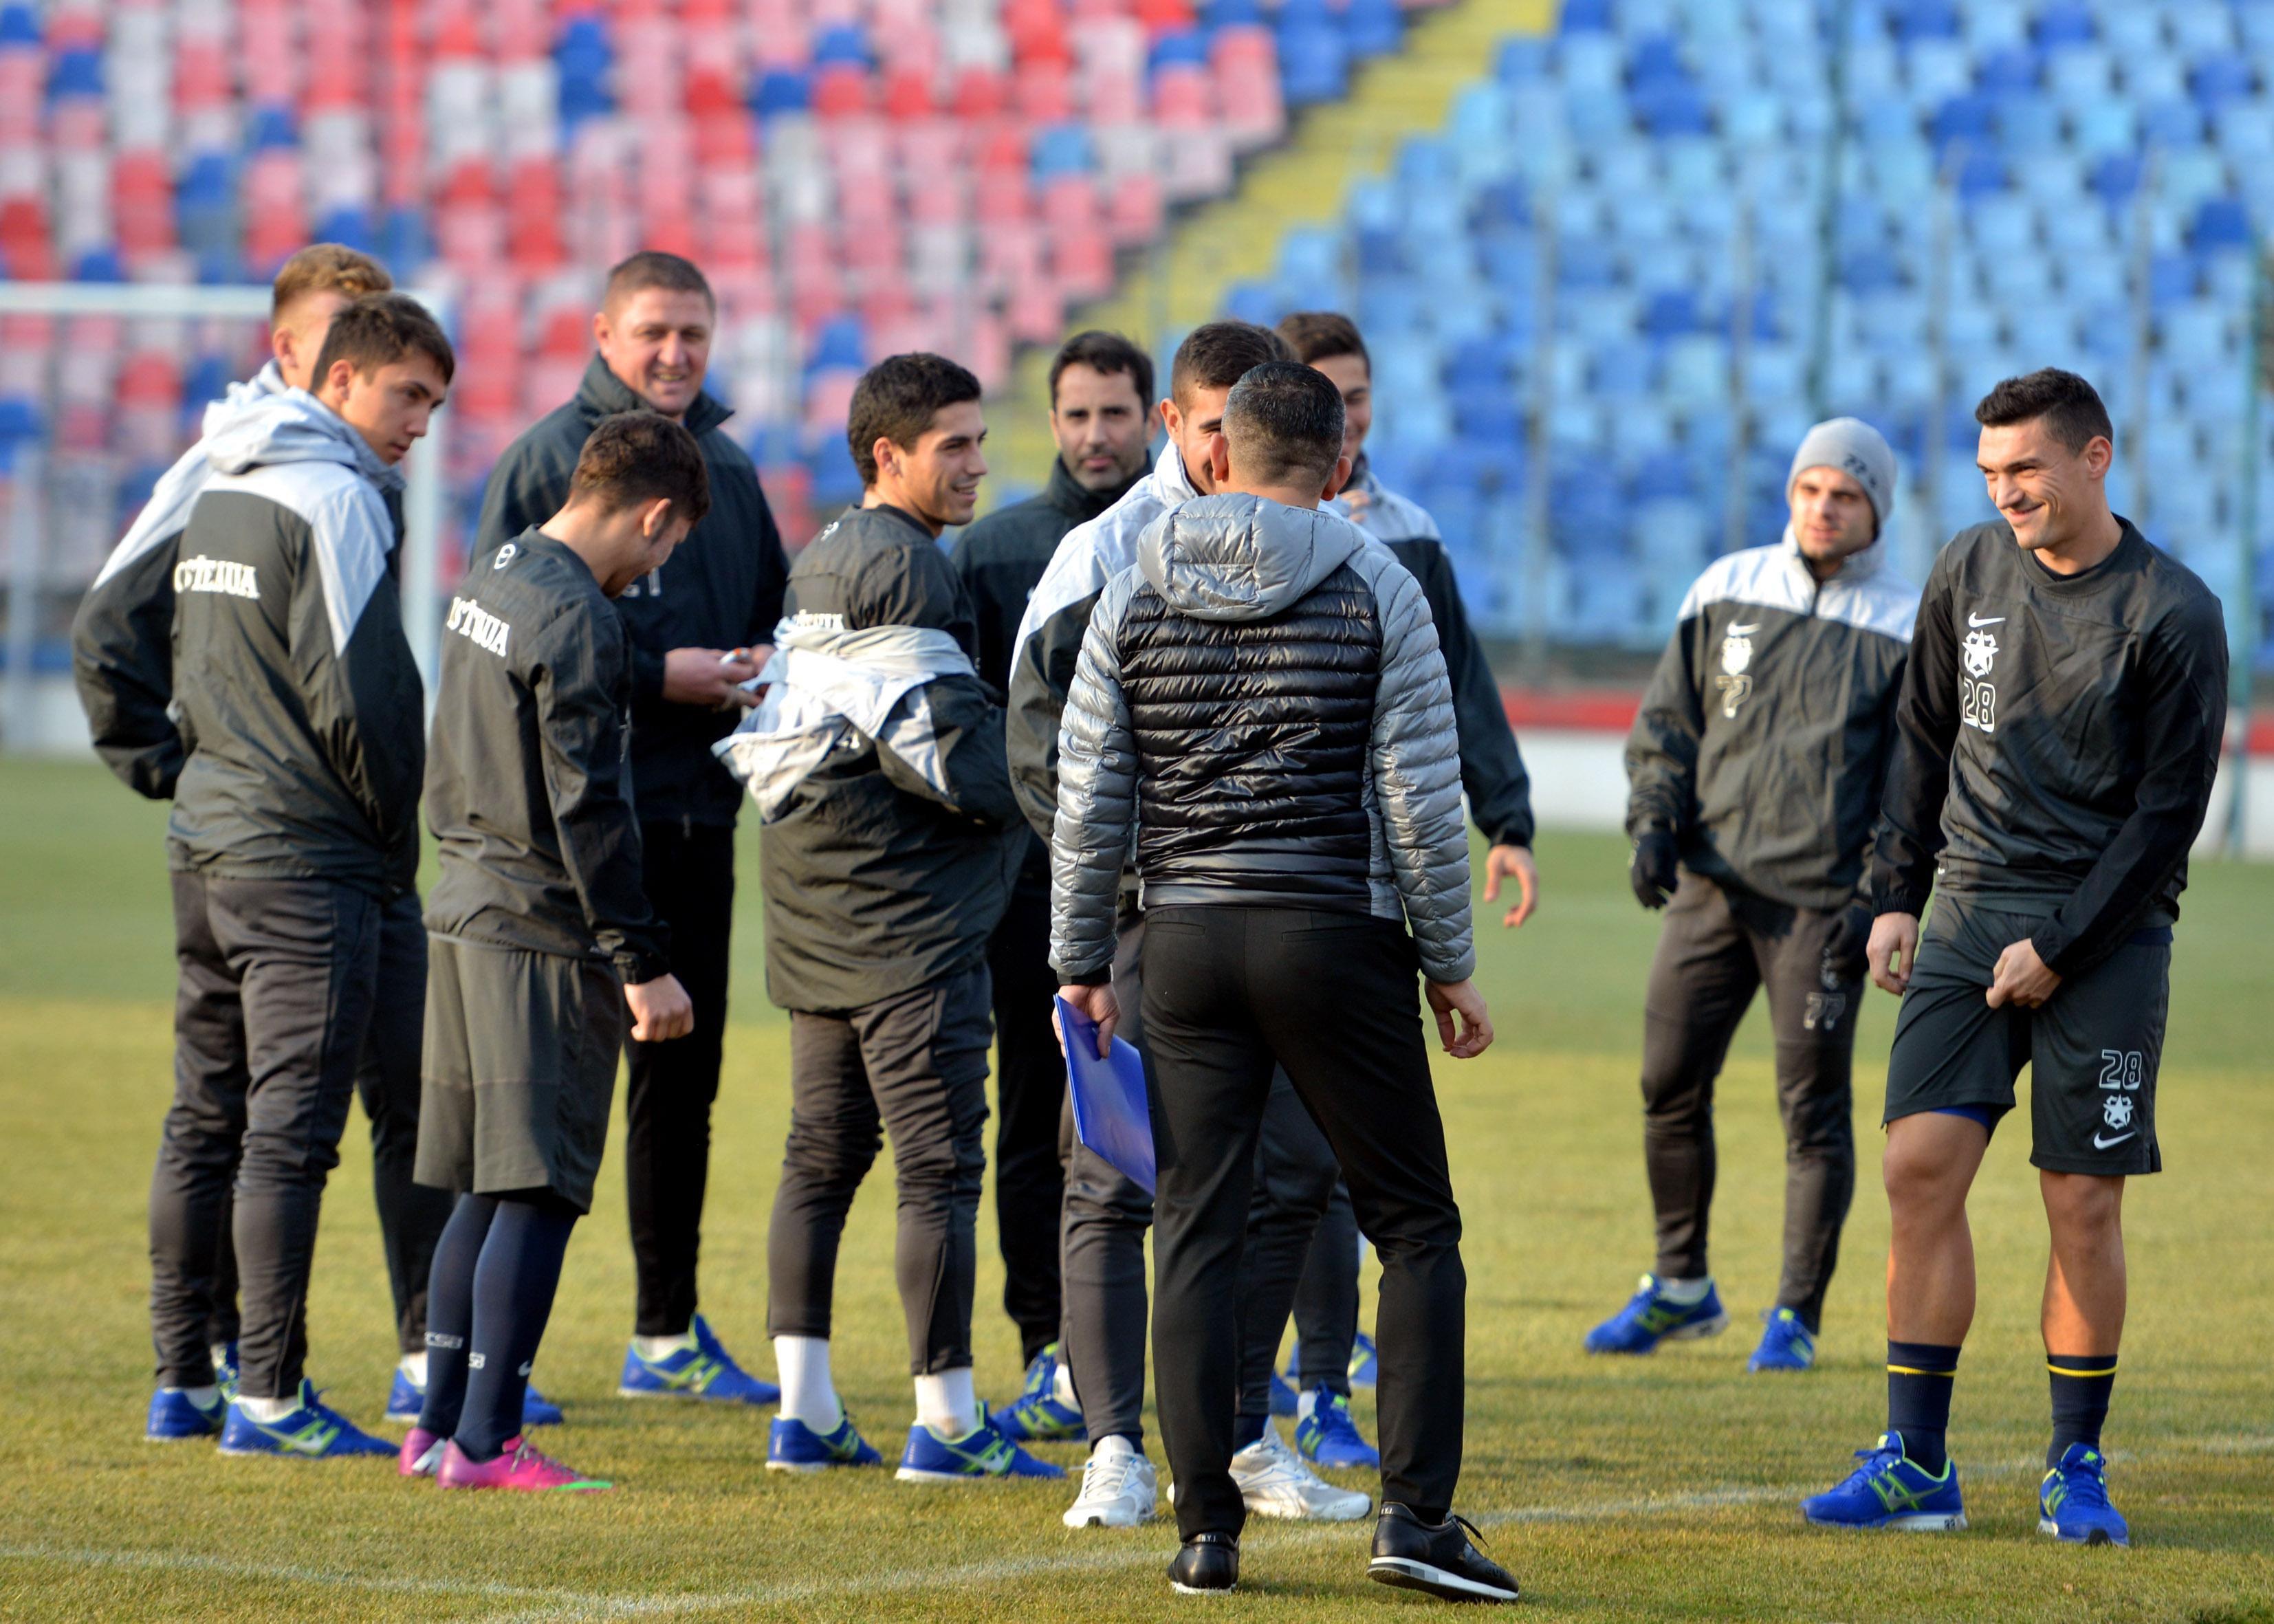 2.FOTBAL:ANTRENAMENT FC STEAUA BUCURESTI (9.01.2014)